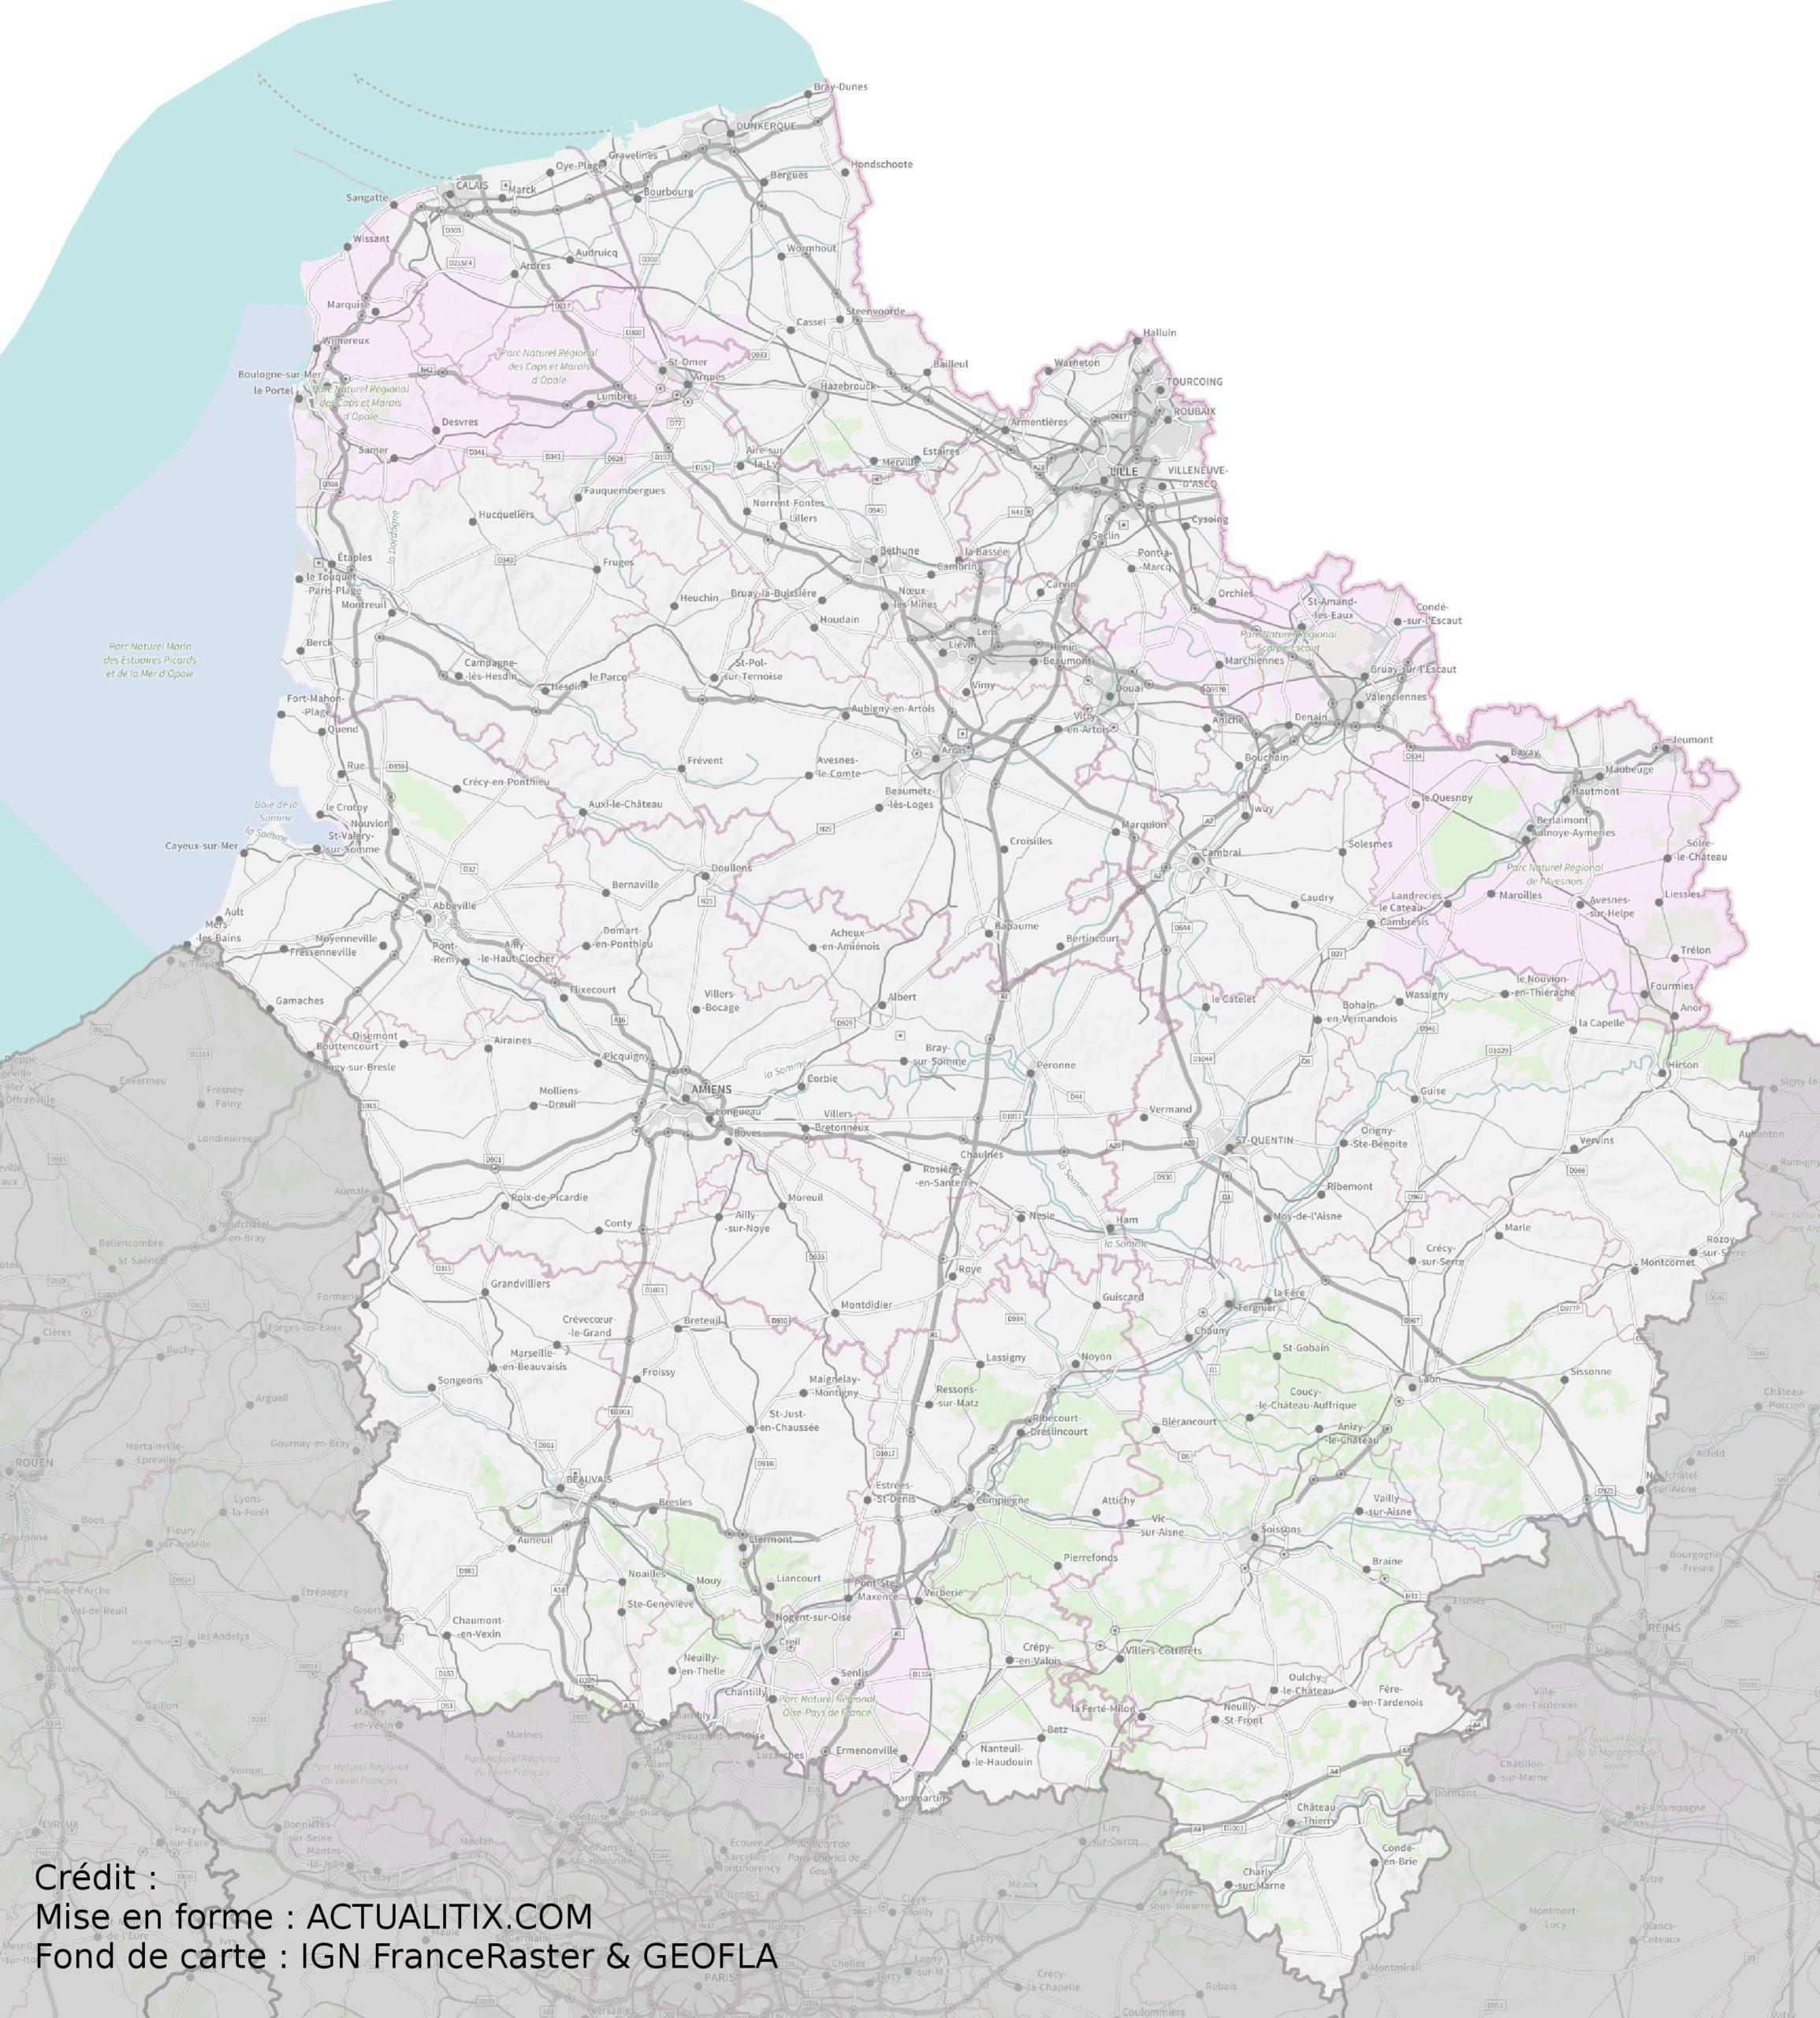 Carte Des Hauts-De-France - Hauts-De-France Carte Des Villes destiné Carte France Vierge Villes